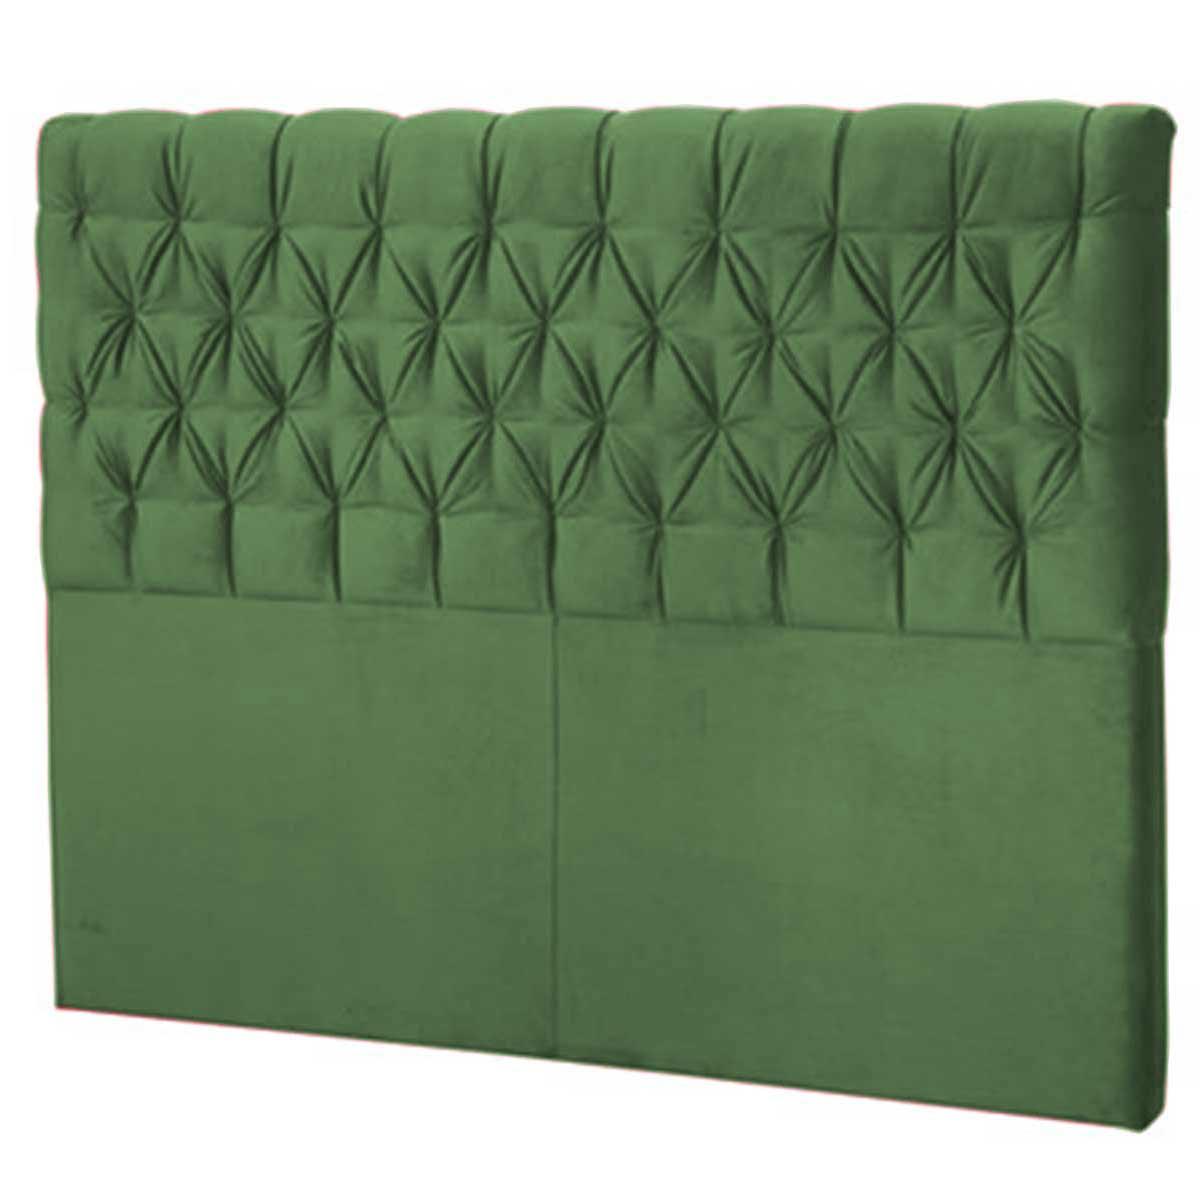 Cabeceira Florença Casal 140 cm Verde Perfan Móveis